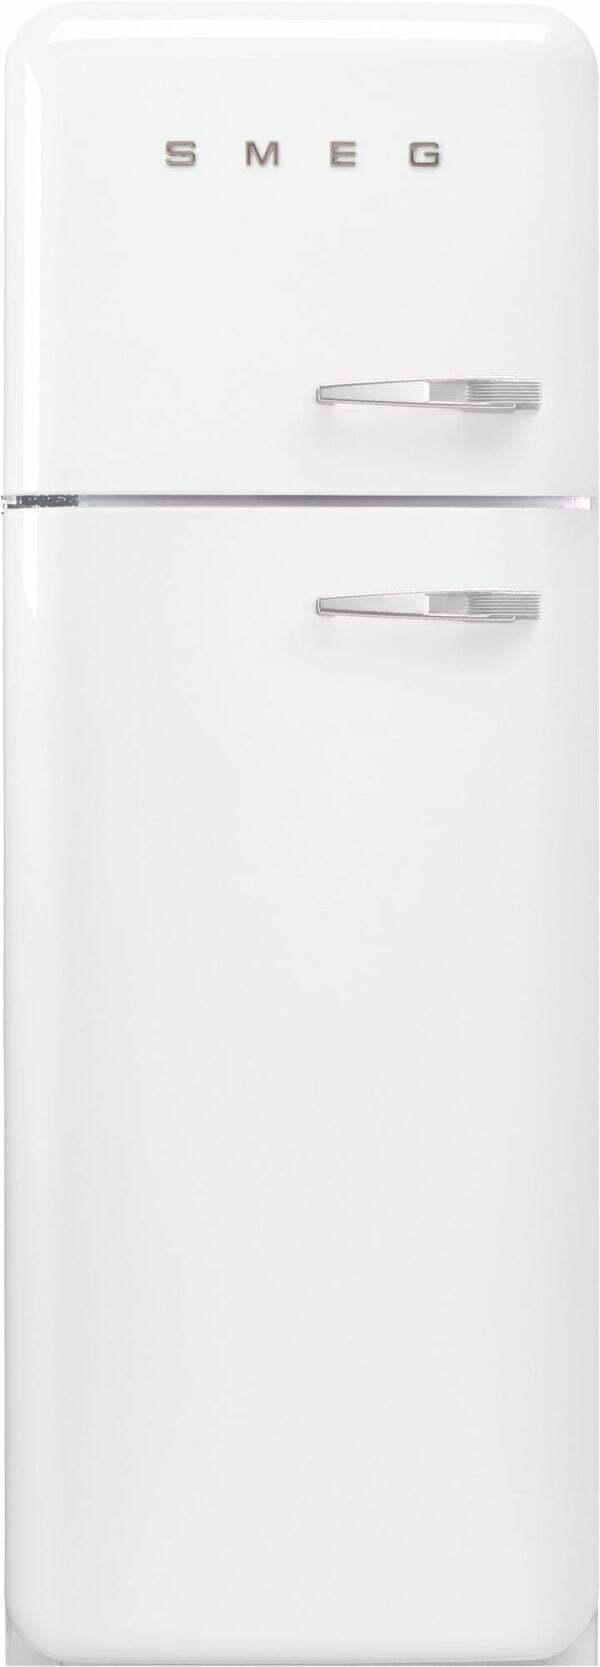 Smeg 50's Style kølefryseskab FAB30LWH5 (hvid)